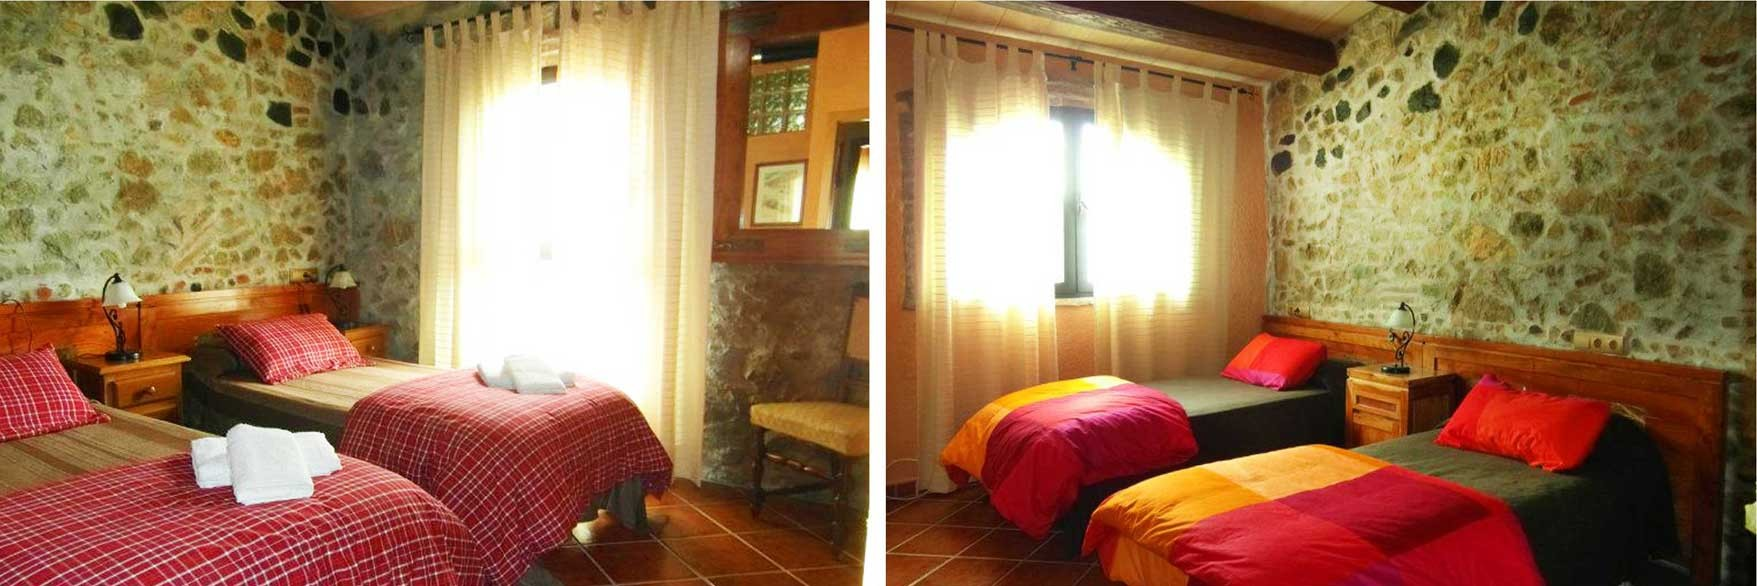 Habitaciones dobles: Els Camps y El Castell